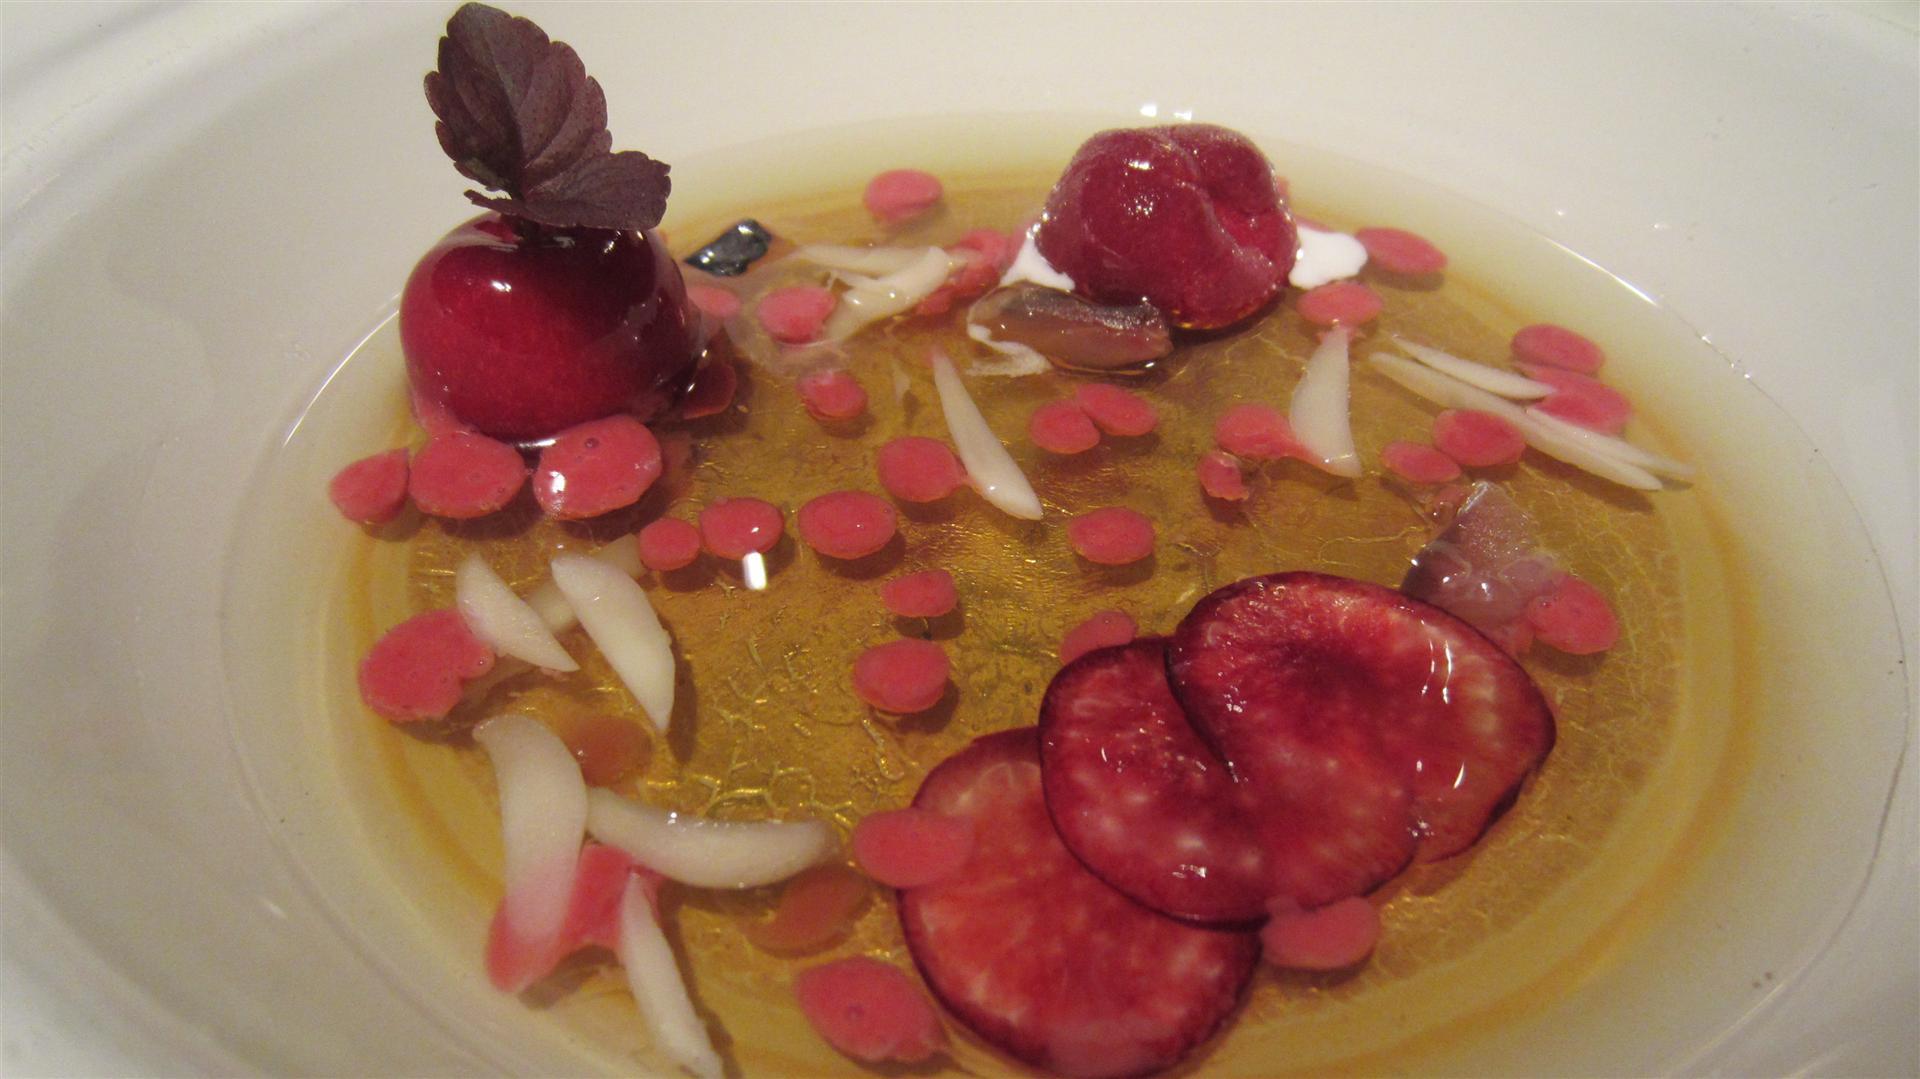 Restaurante en Girona Elder infusion (or was it just water?), cherries and ice cream